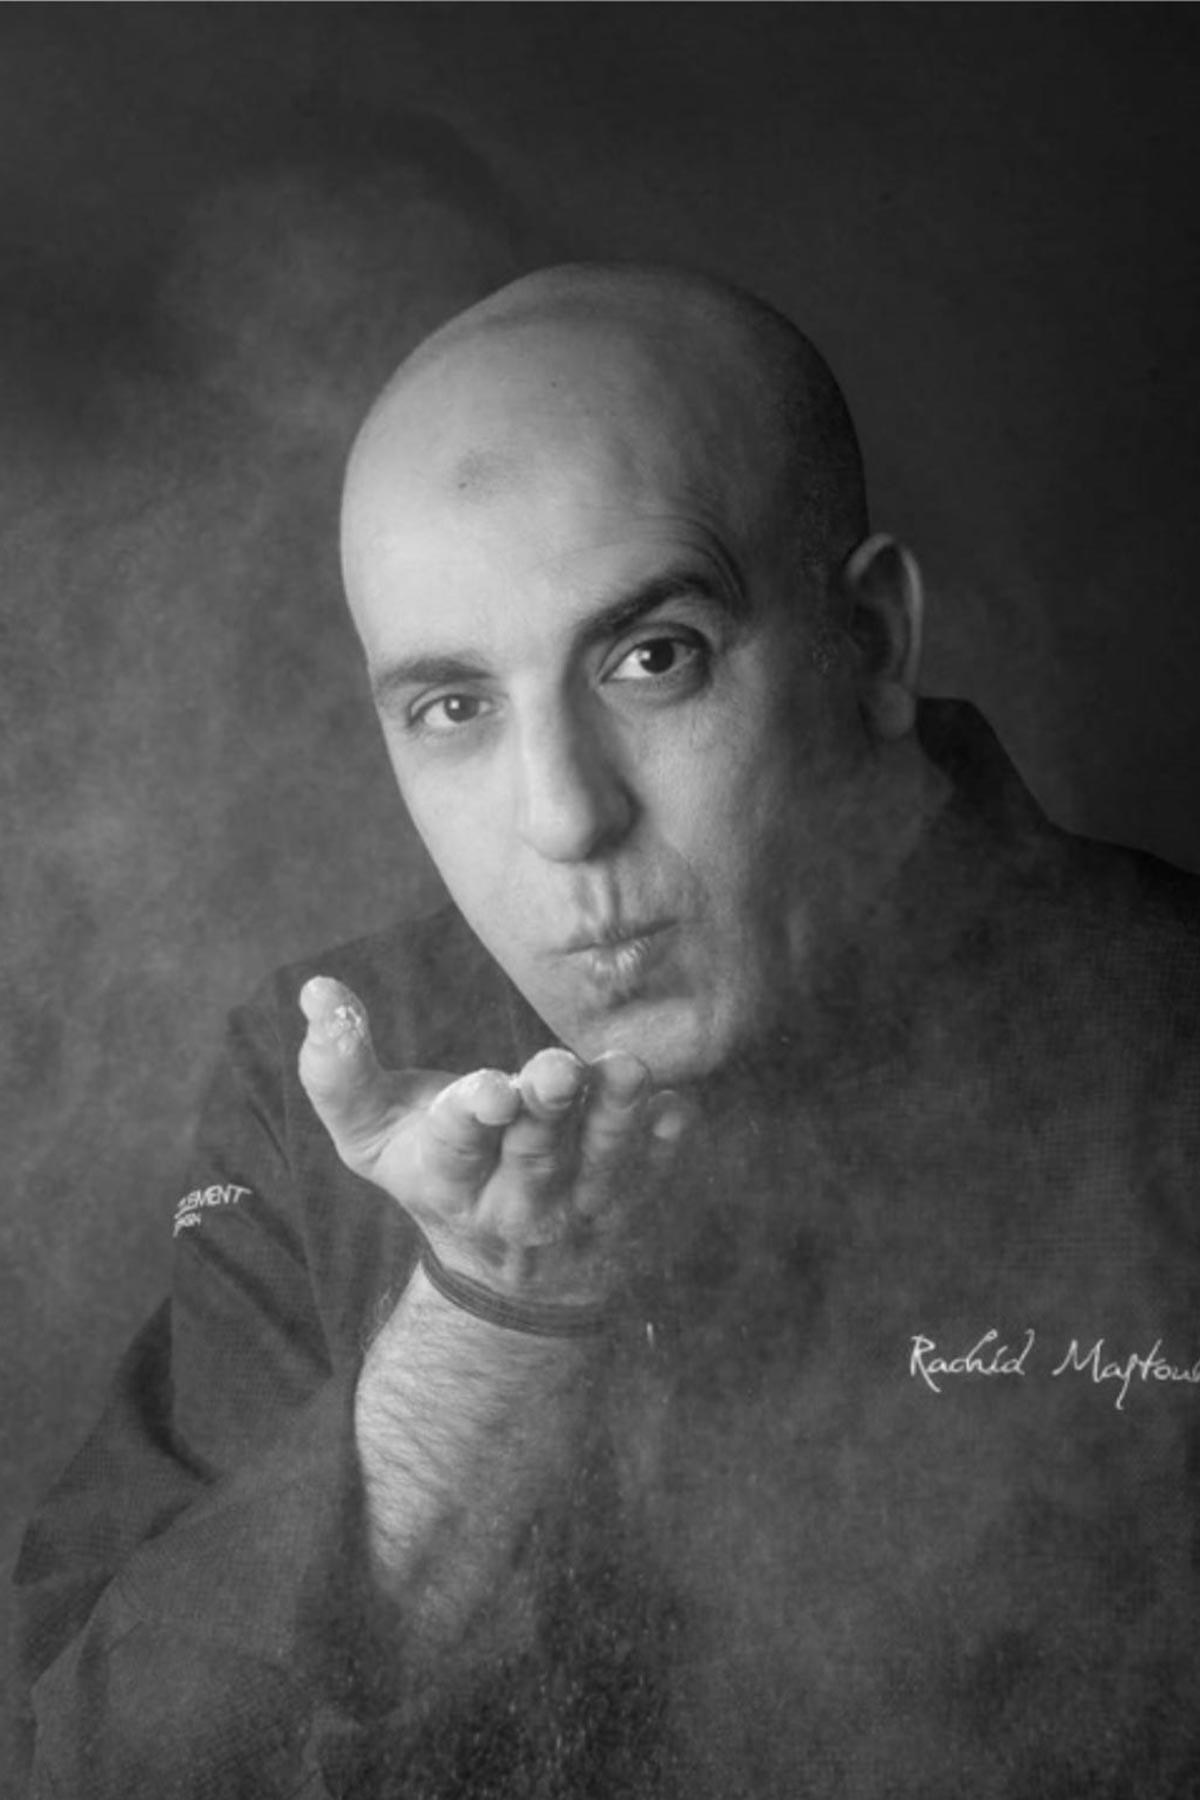 MAFTOUH Rachid